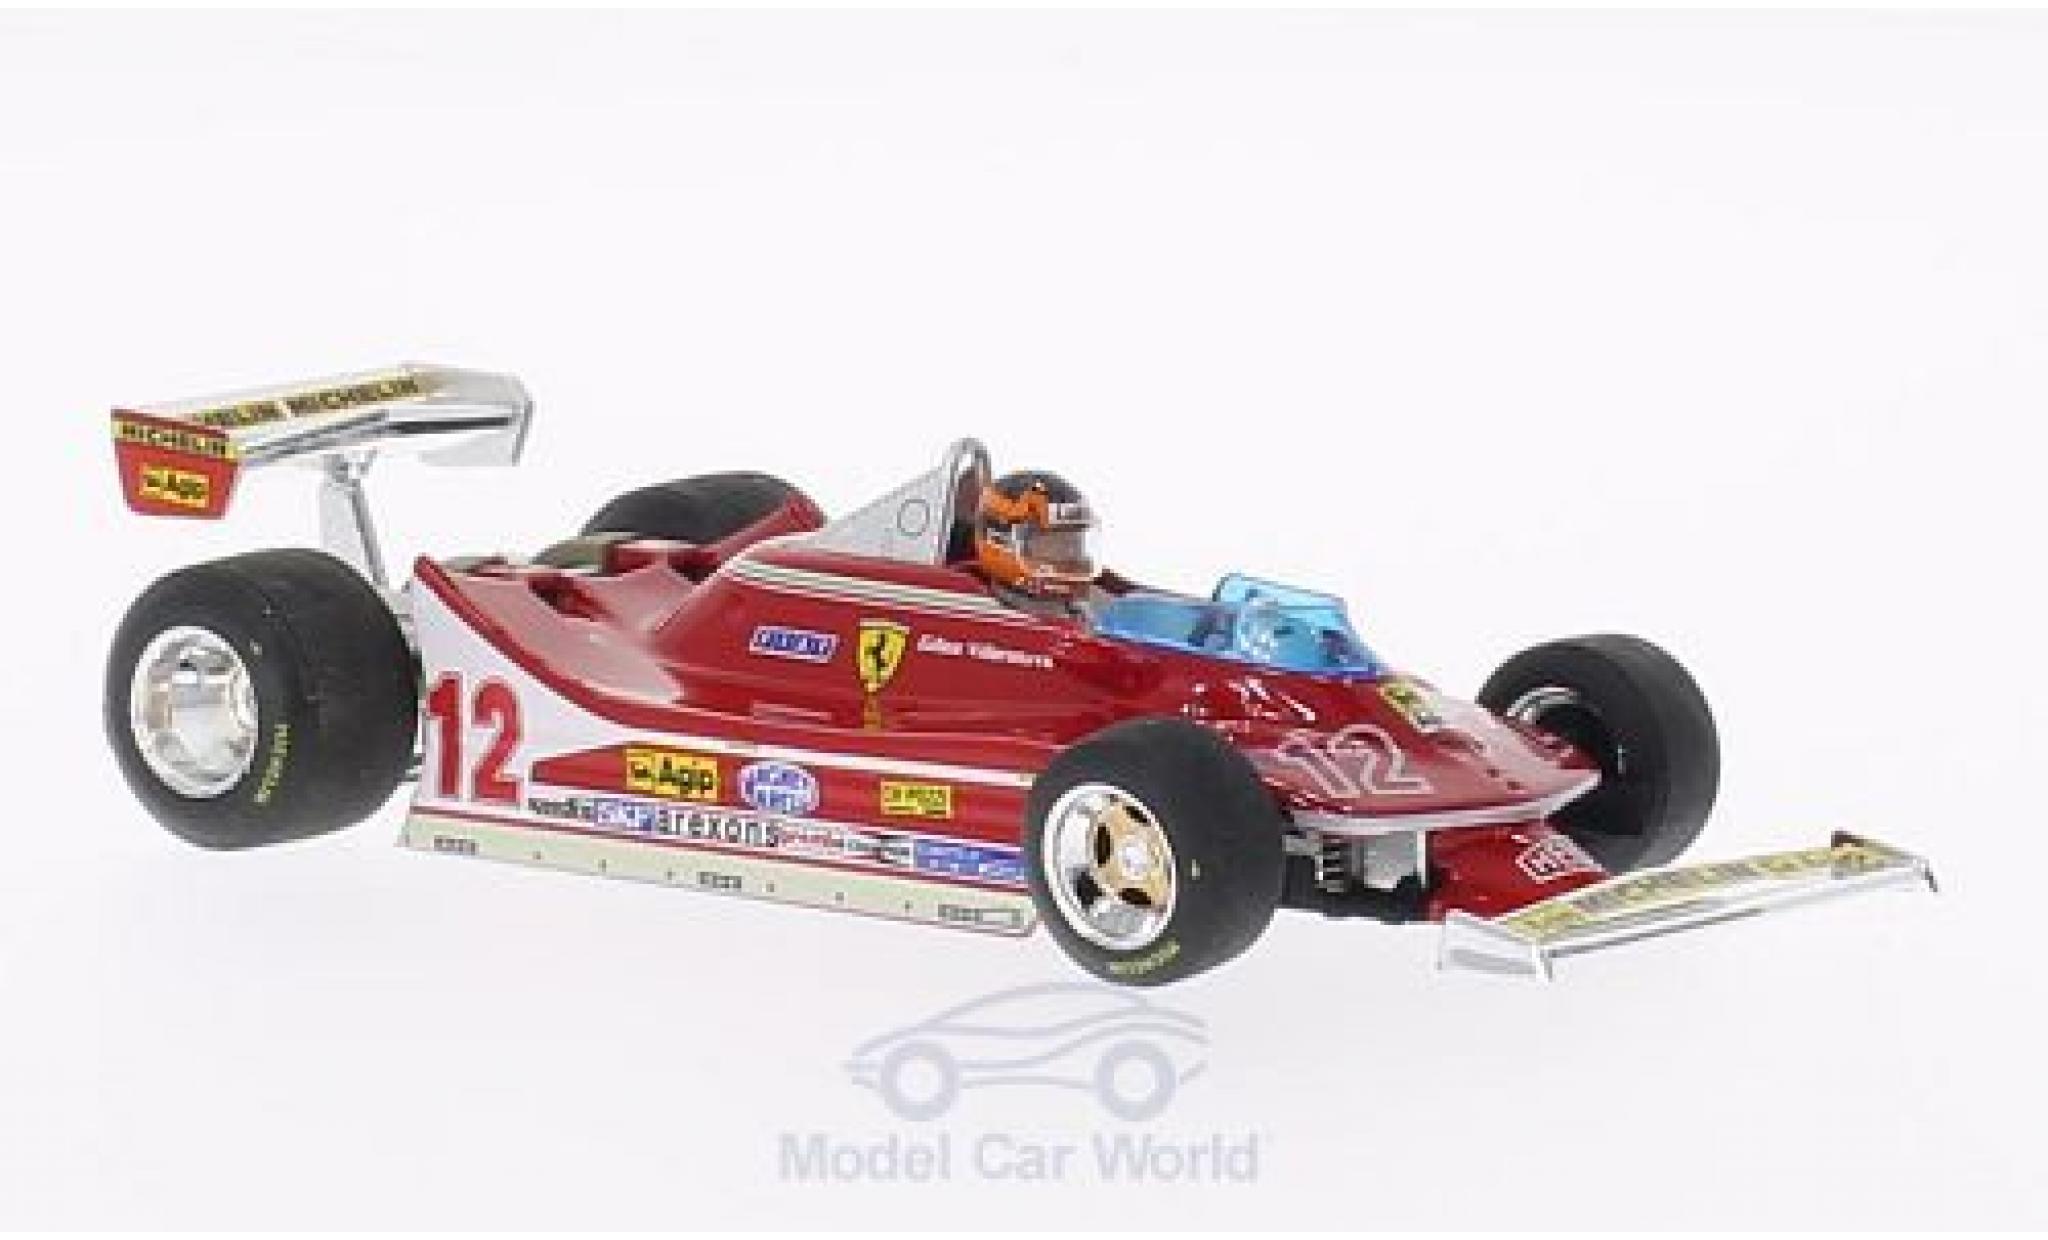 Ferrari 312 T4 1/43 Brumm T4 No.12 GP Frankreich 1979 mit Fahrerfigur G.Villeneuve